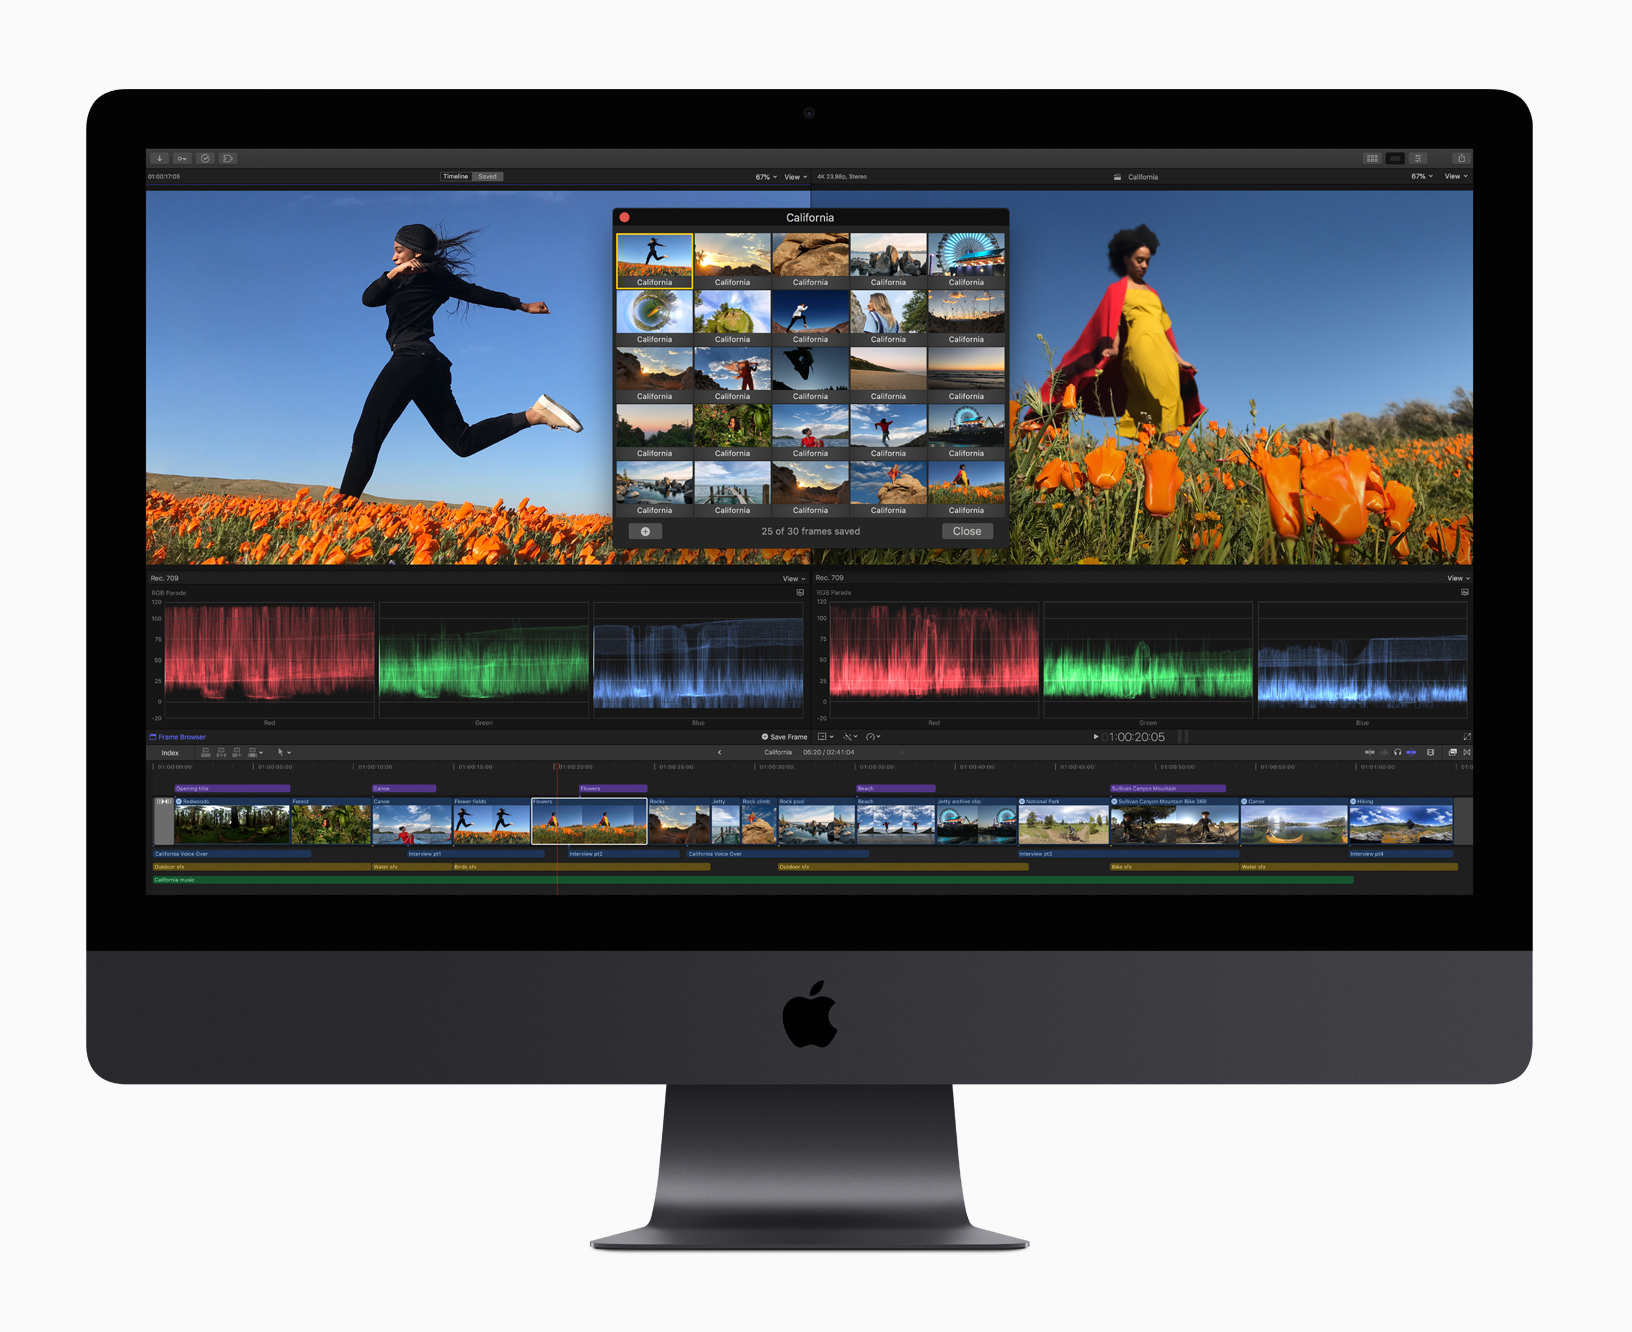 Final-Cut-Pro-X-screen-1-11152018.jpg